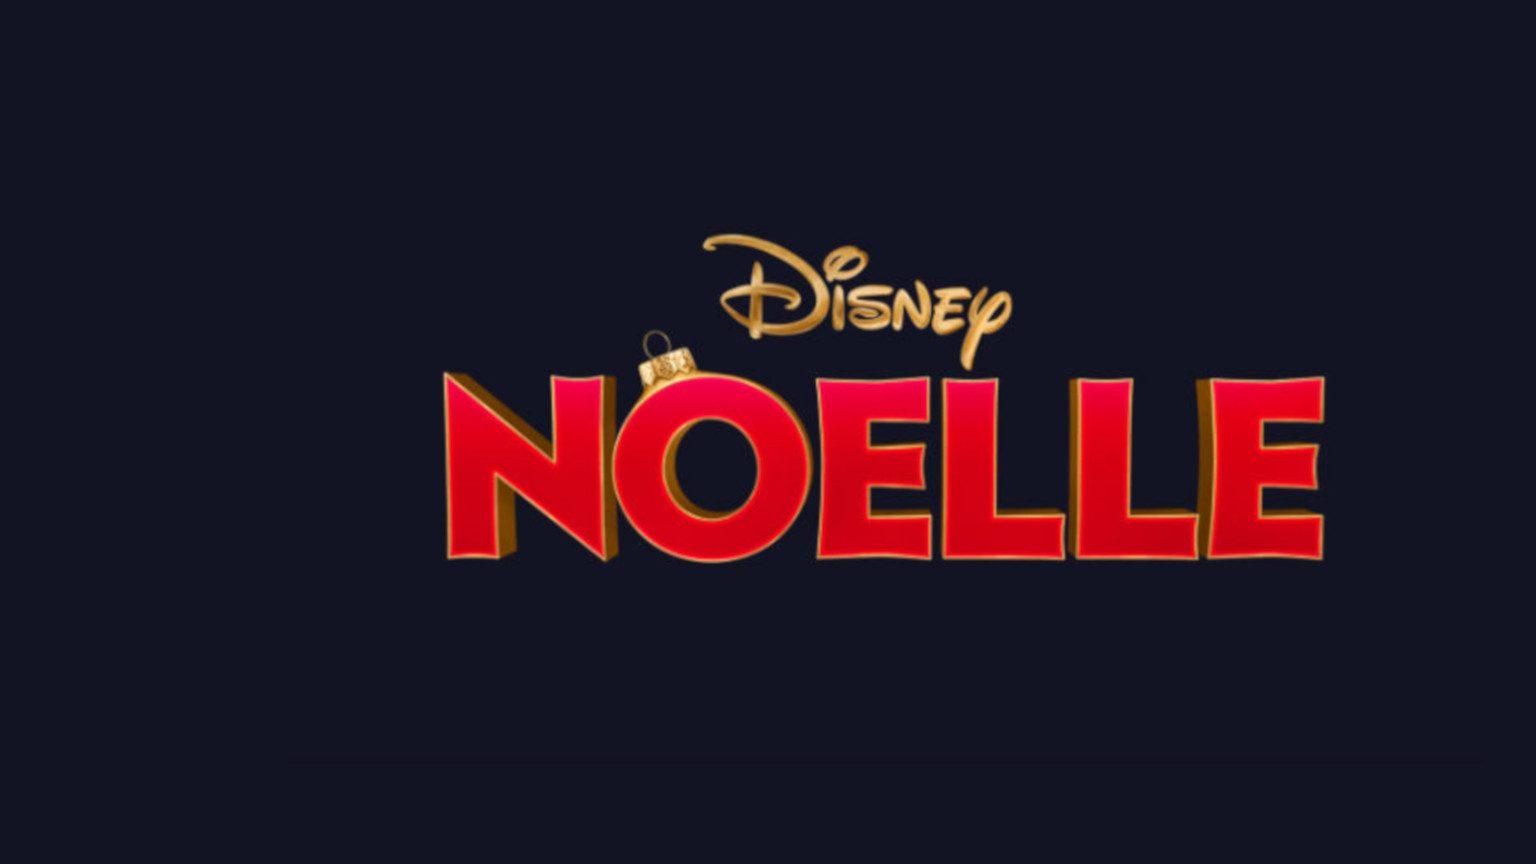 Noelle Disney Plus Movie Poster